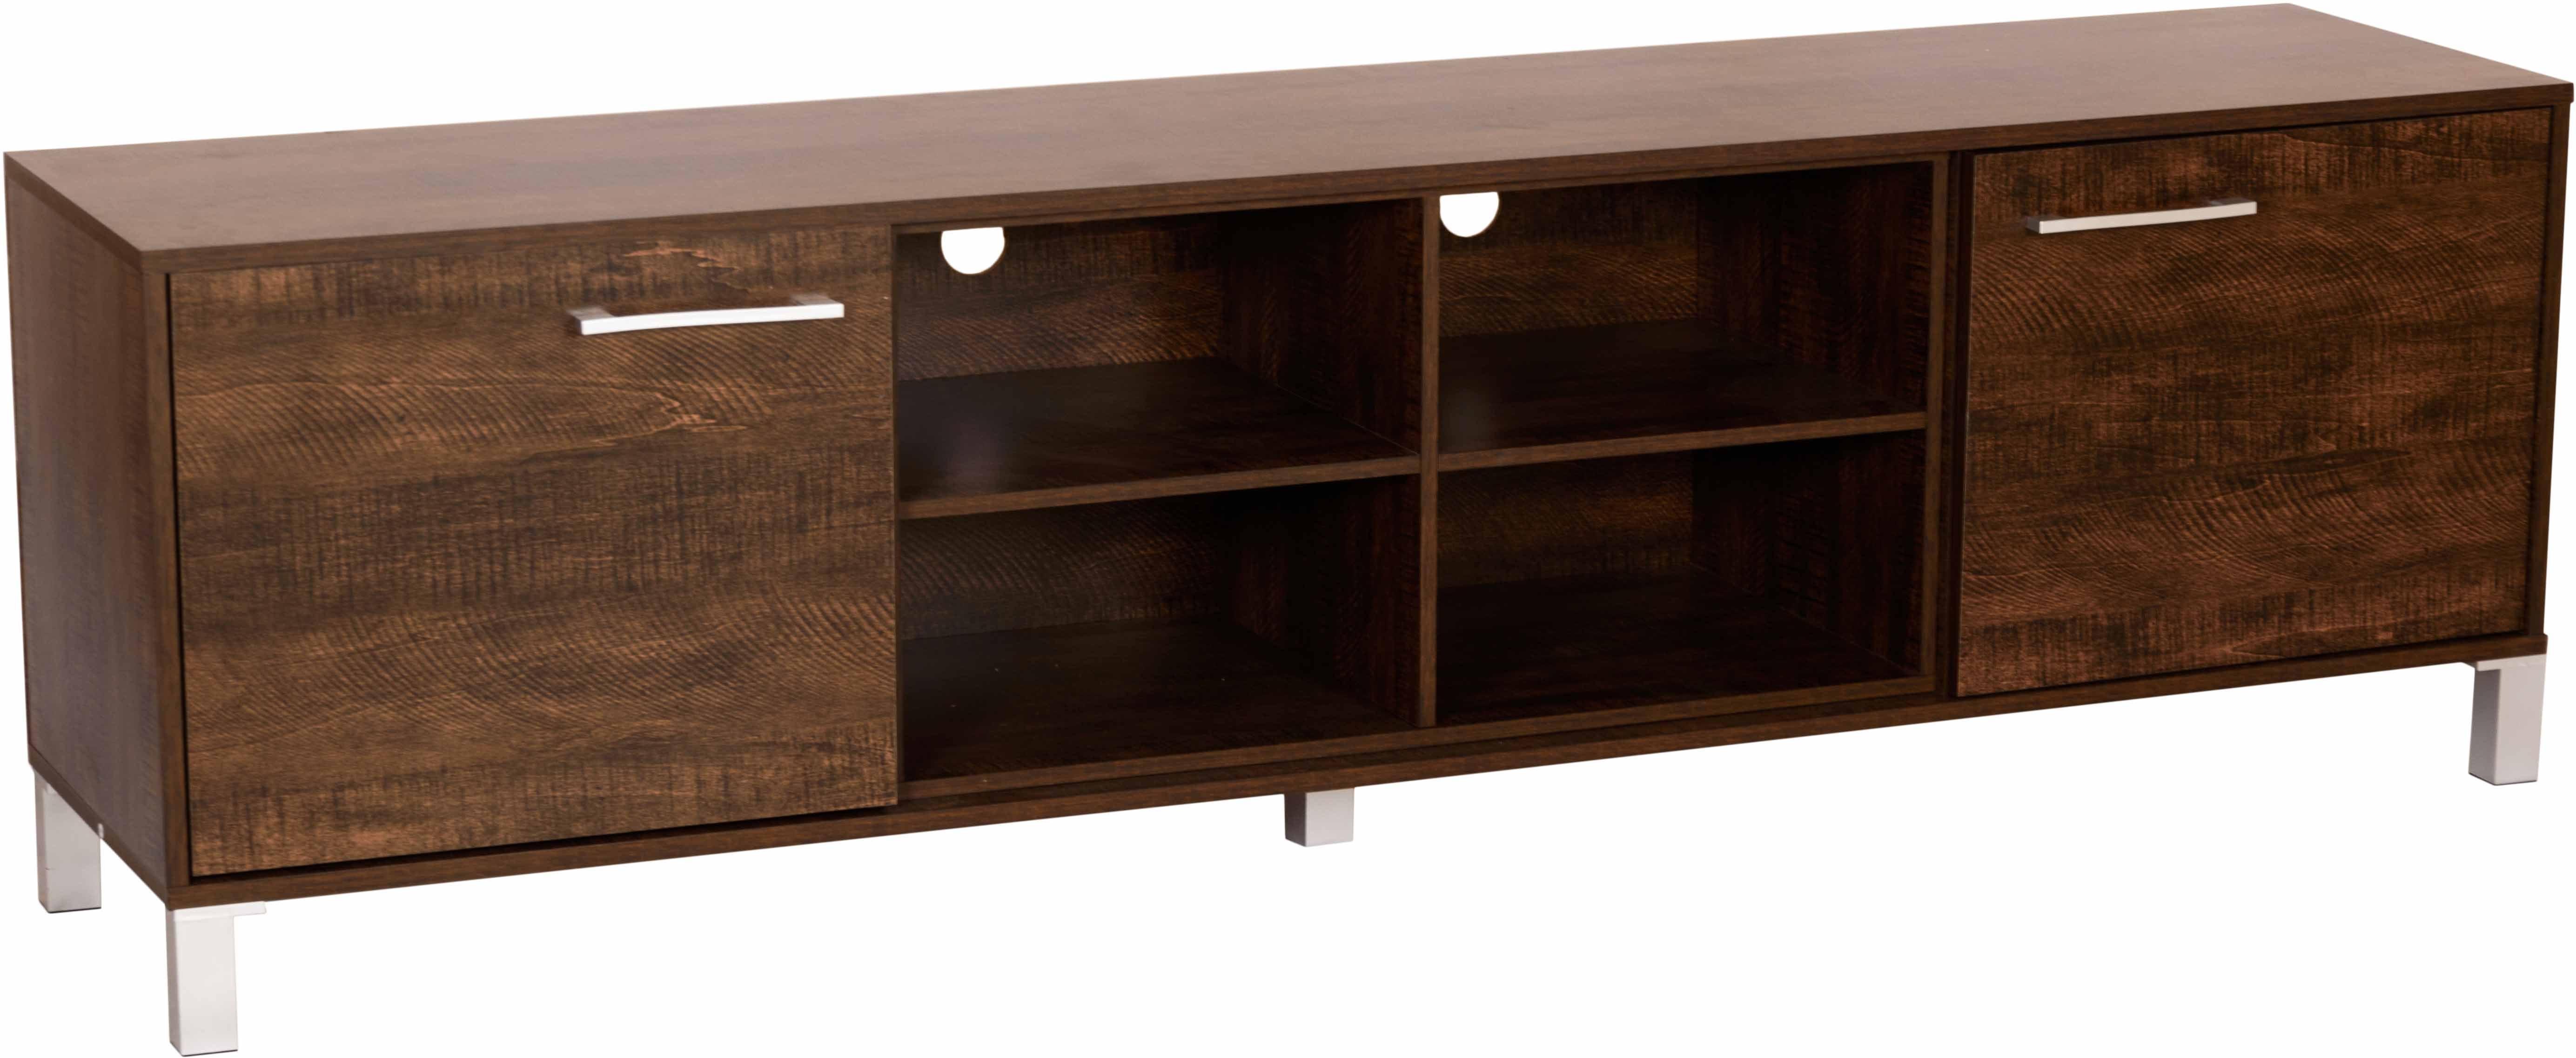 View DeckUp Uniti Engineered Wood TV Entertainment Unit(Finish Color - Wenge Matte) Furniture (DeckUp)